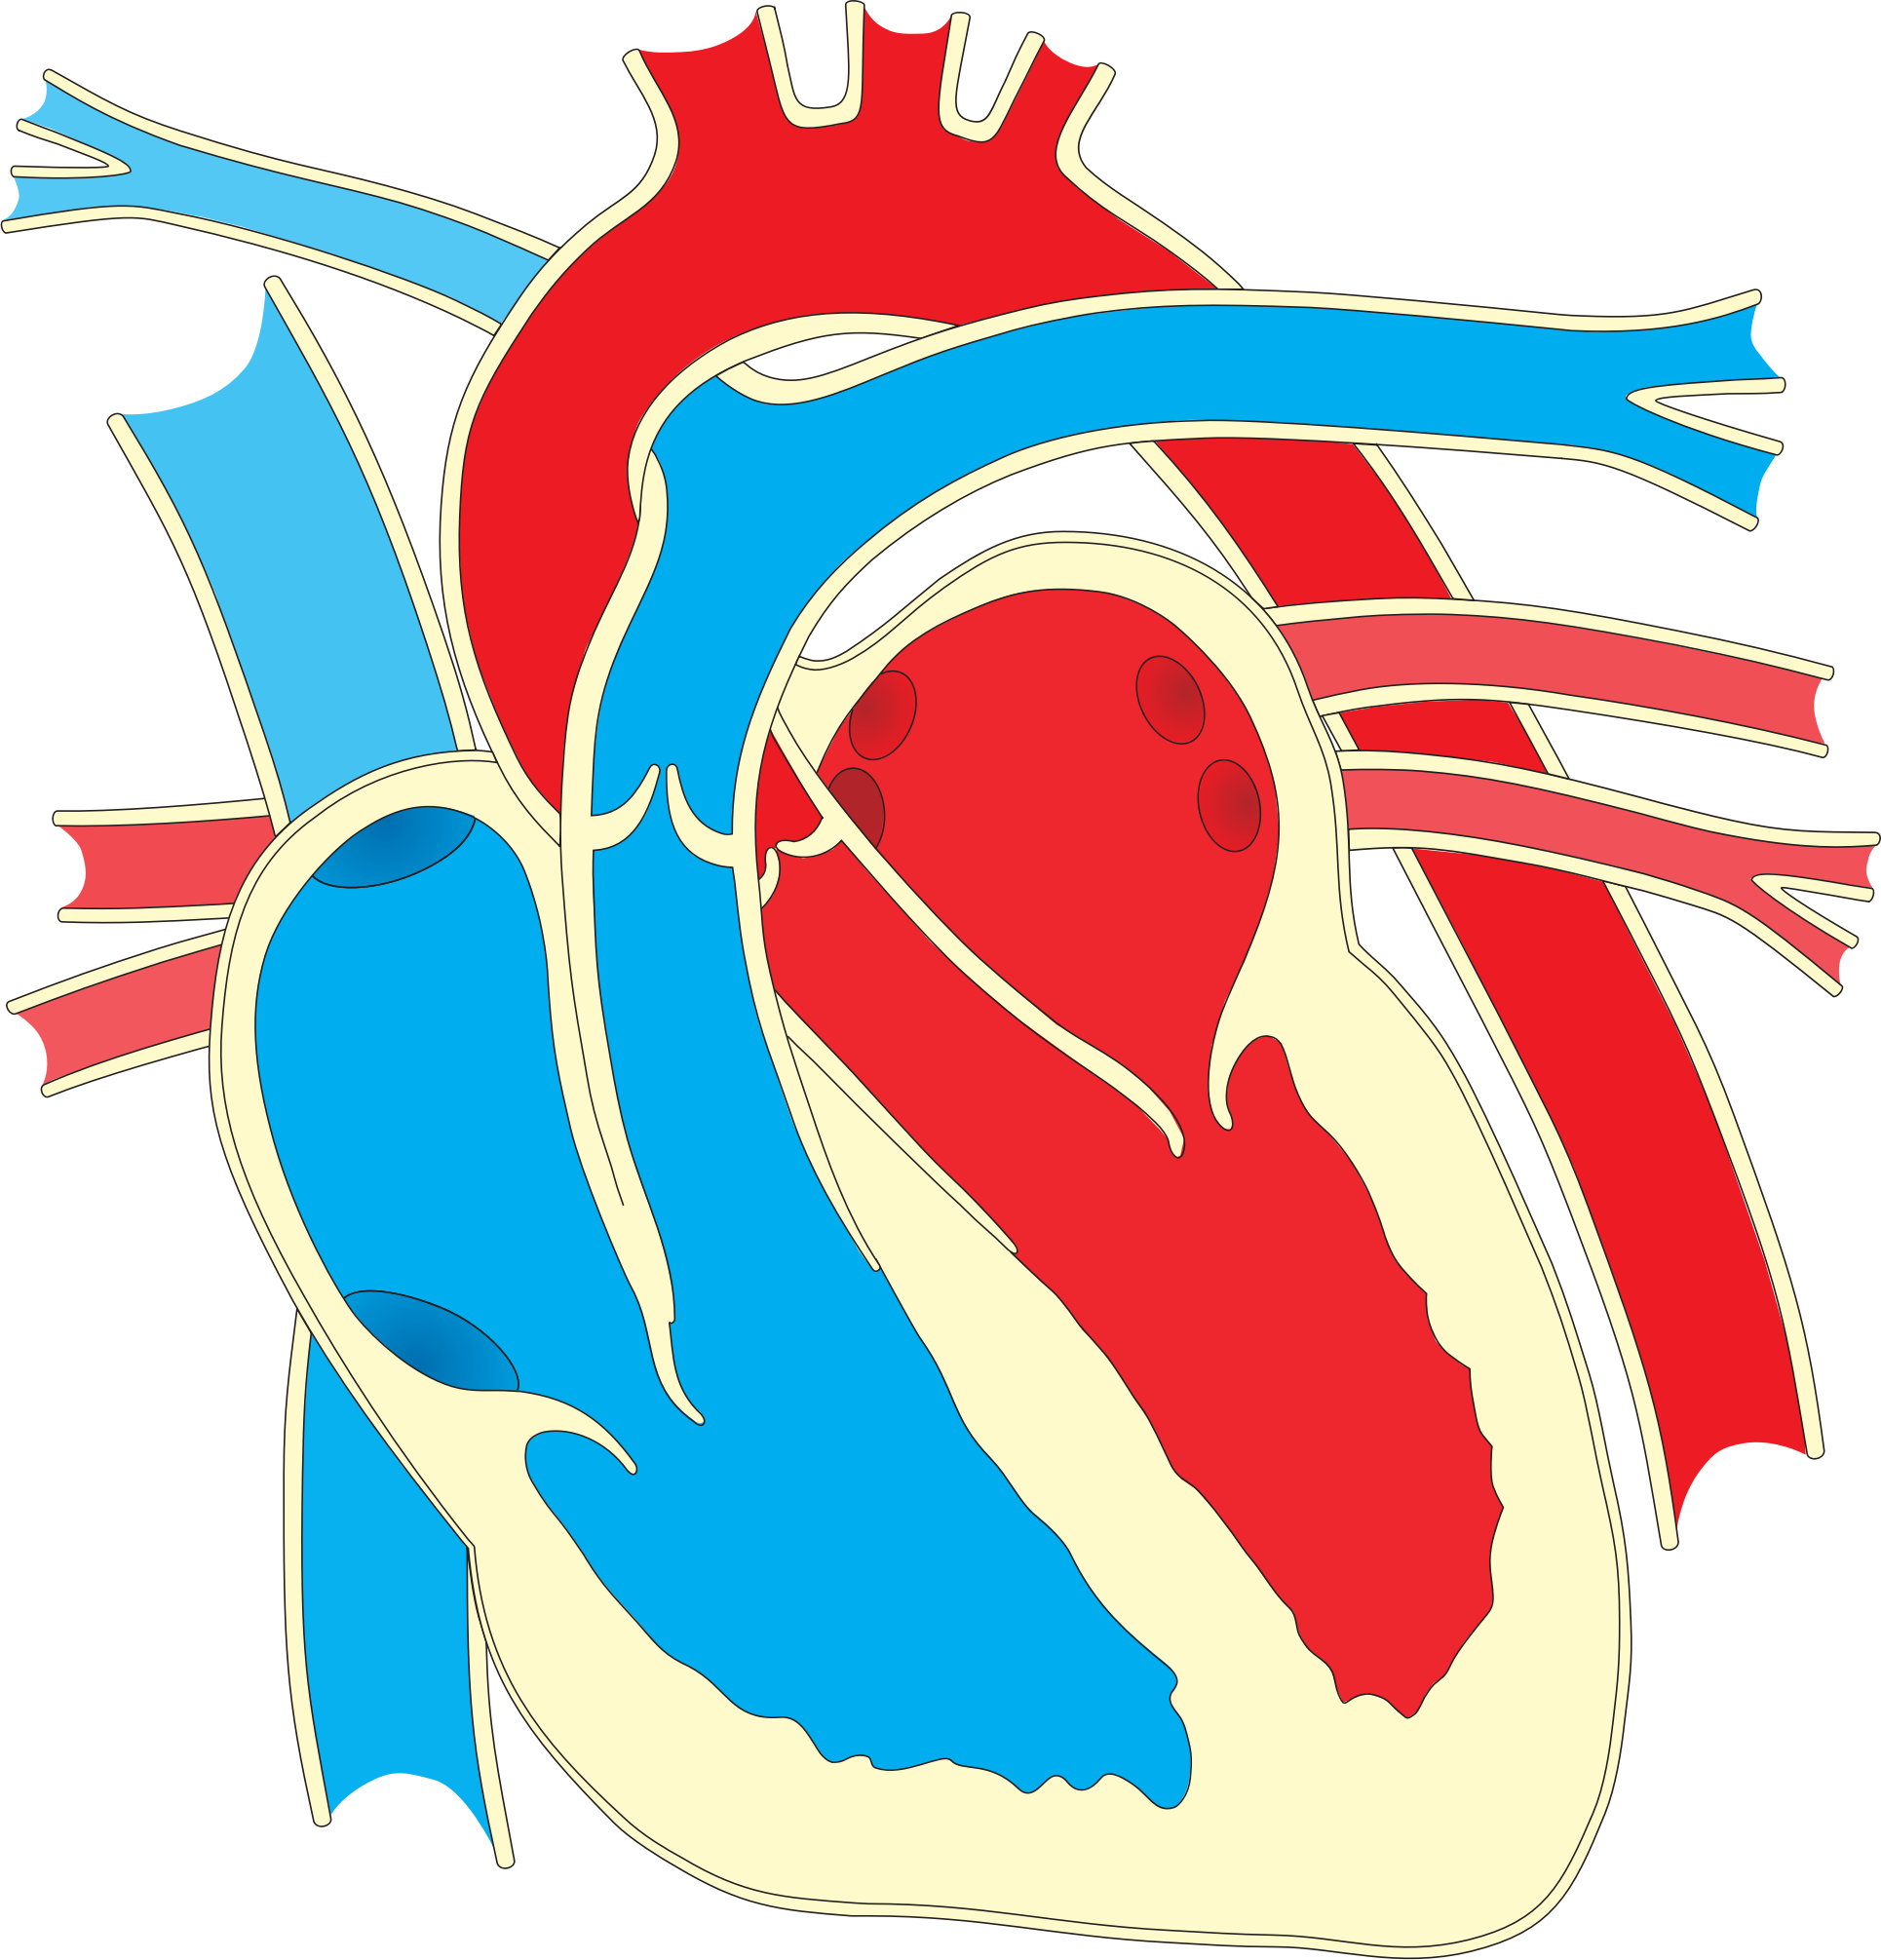 Heart diagram clipart png Clipart - Heart diagram 2 png